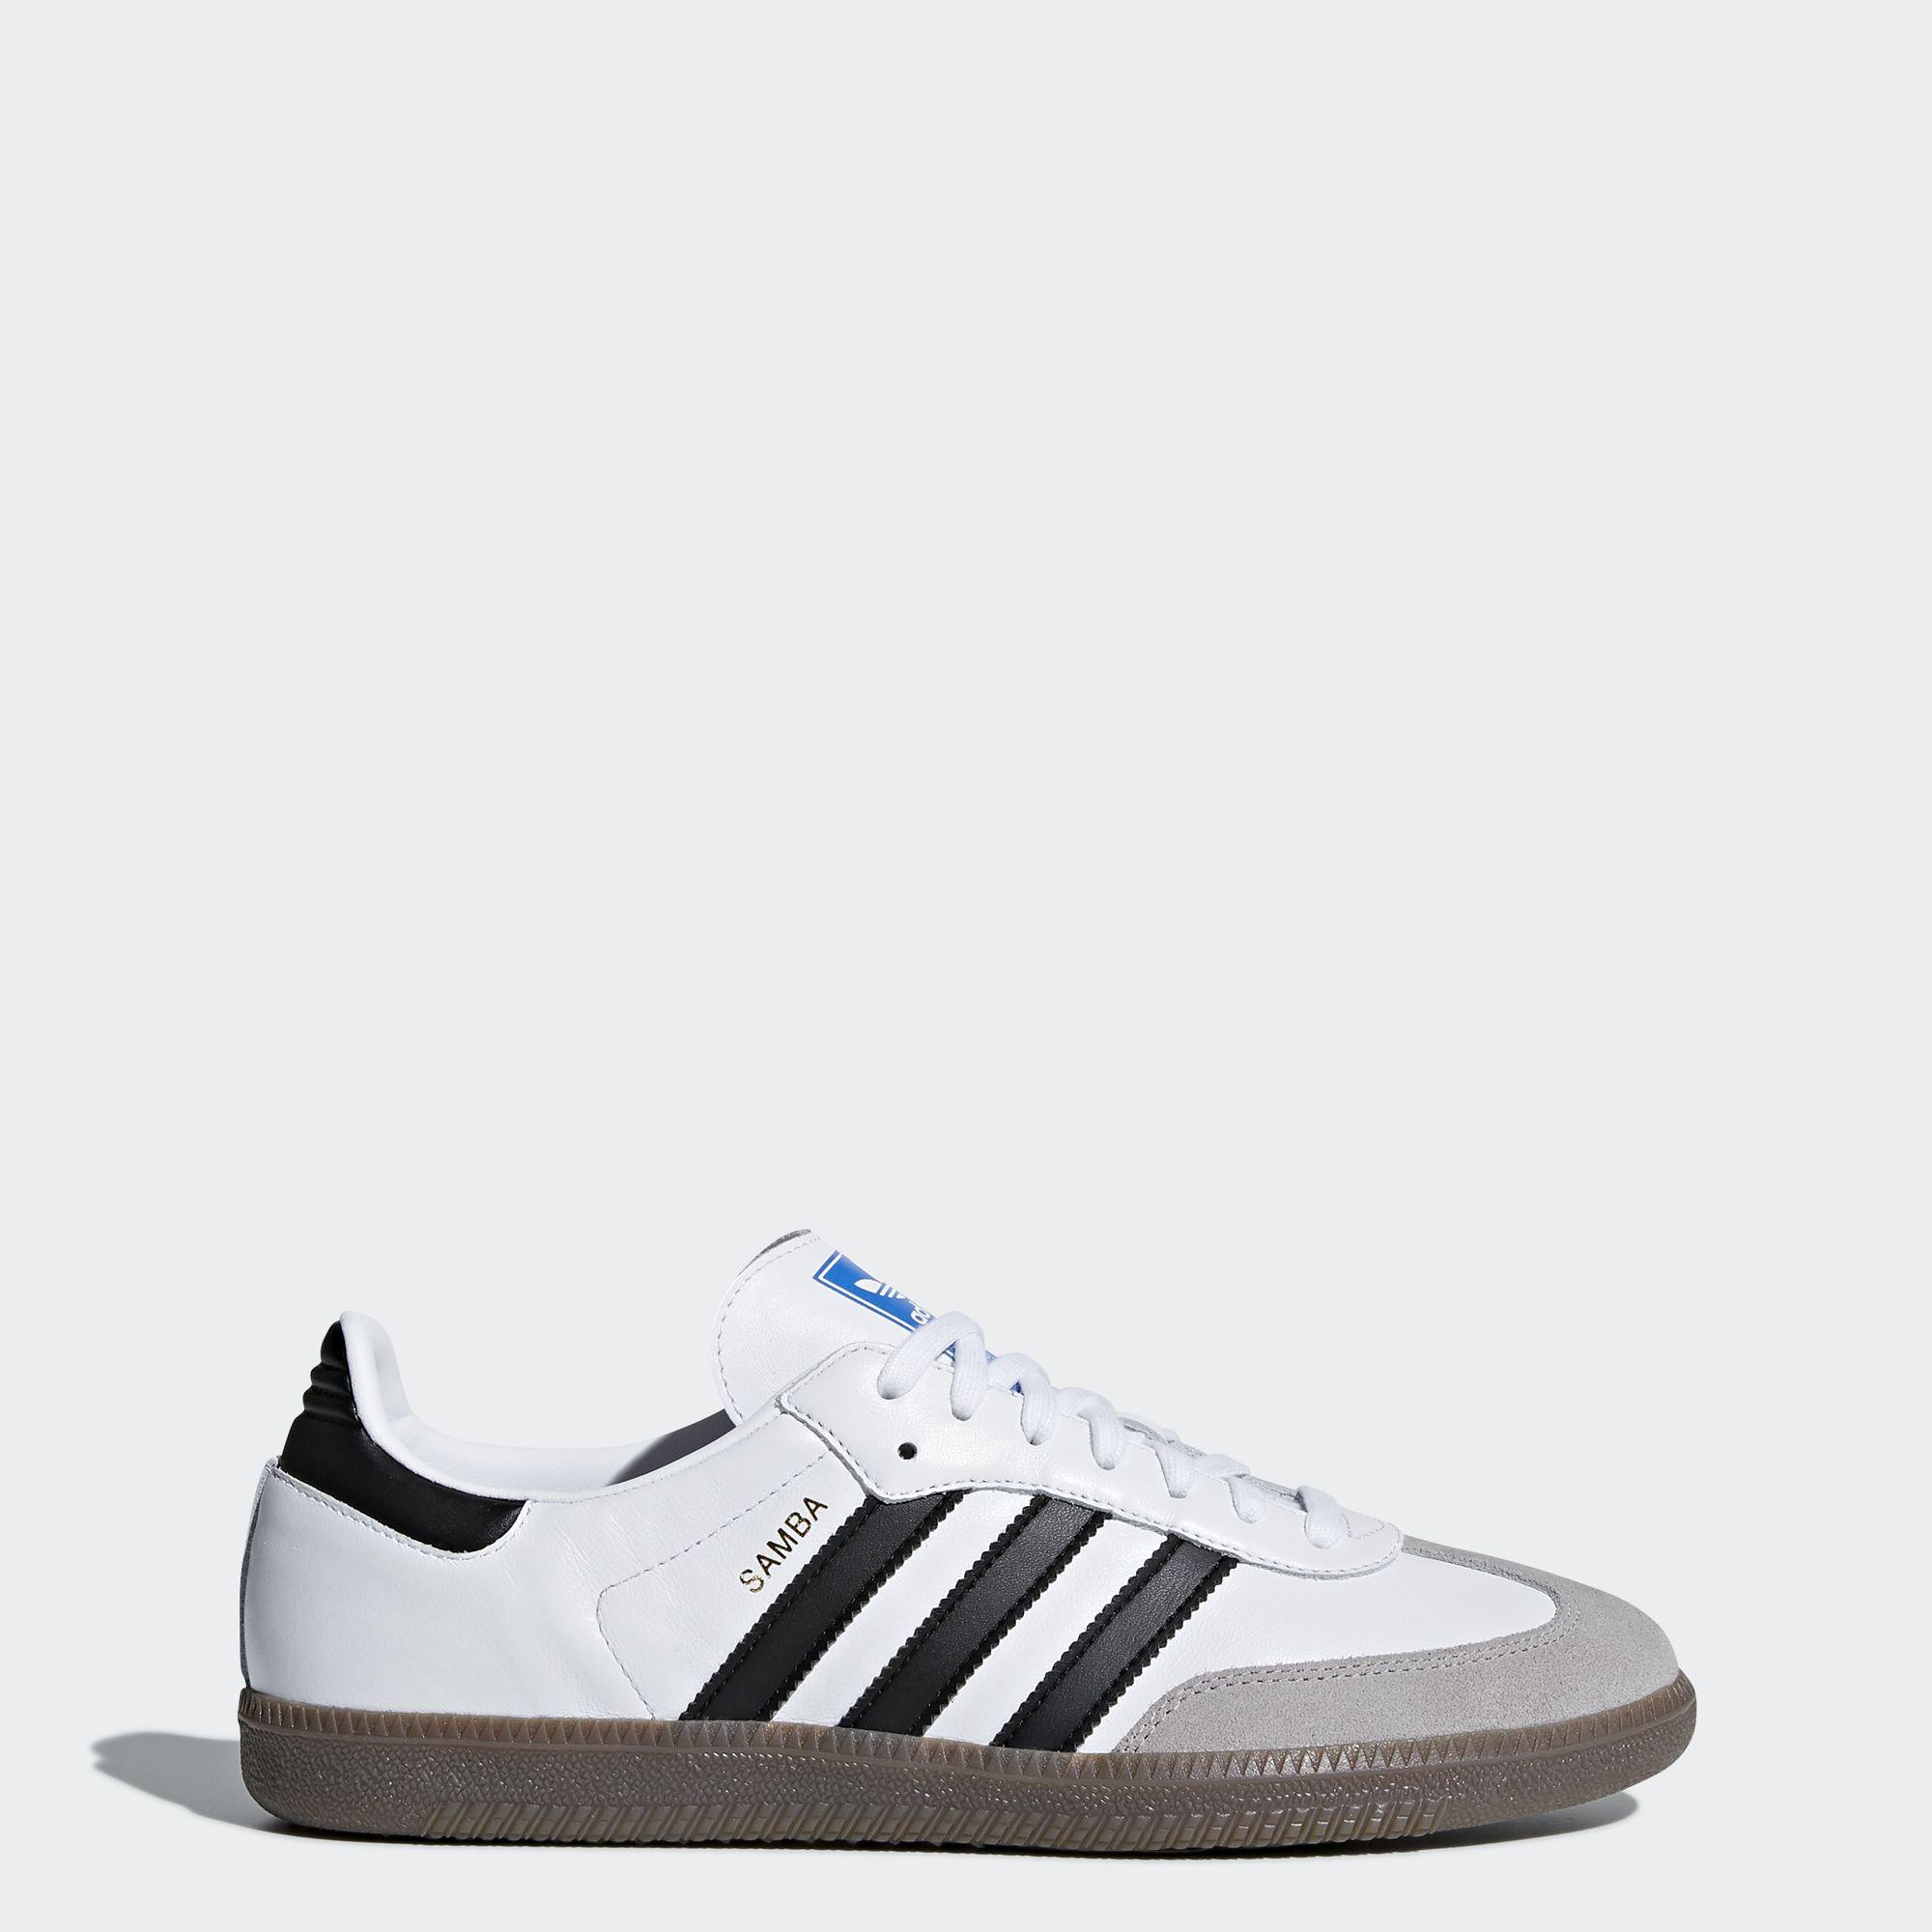 Buy Adidas Sneakers Online | lazada.sg